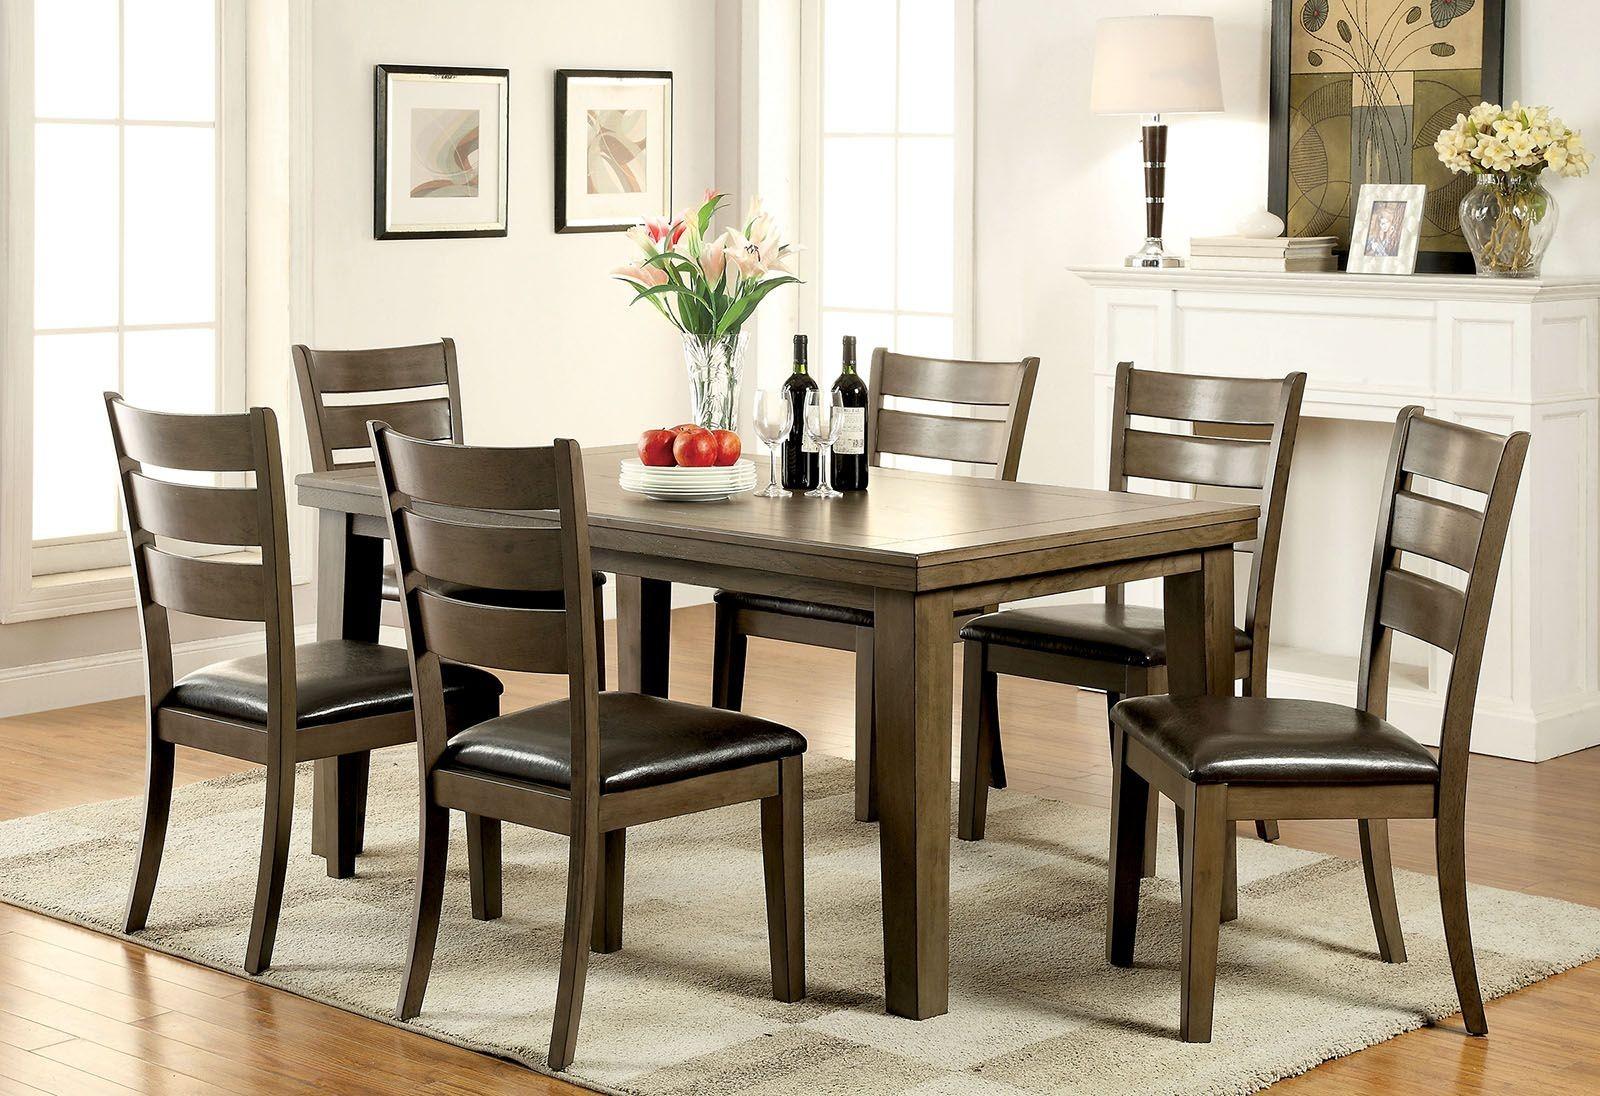 Imelda Gray Rectangular Dining Room Set From Furniture Of